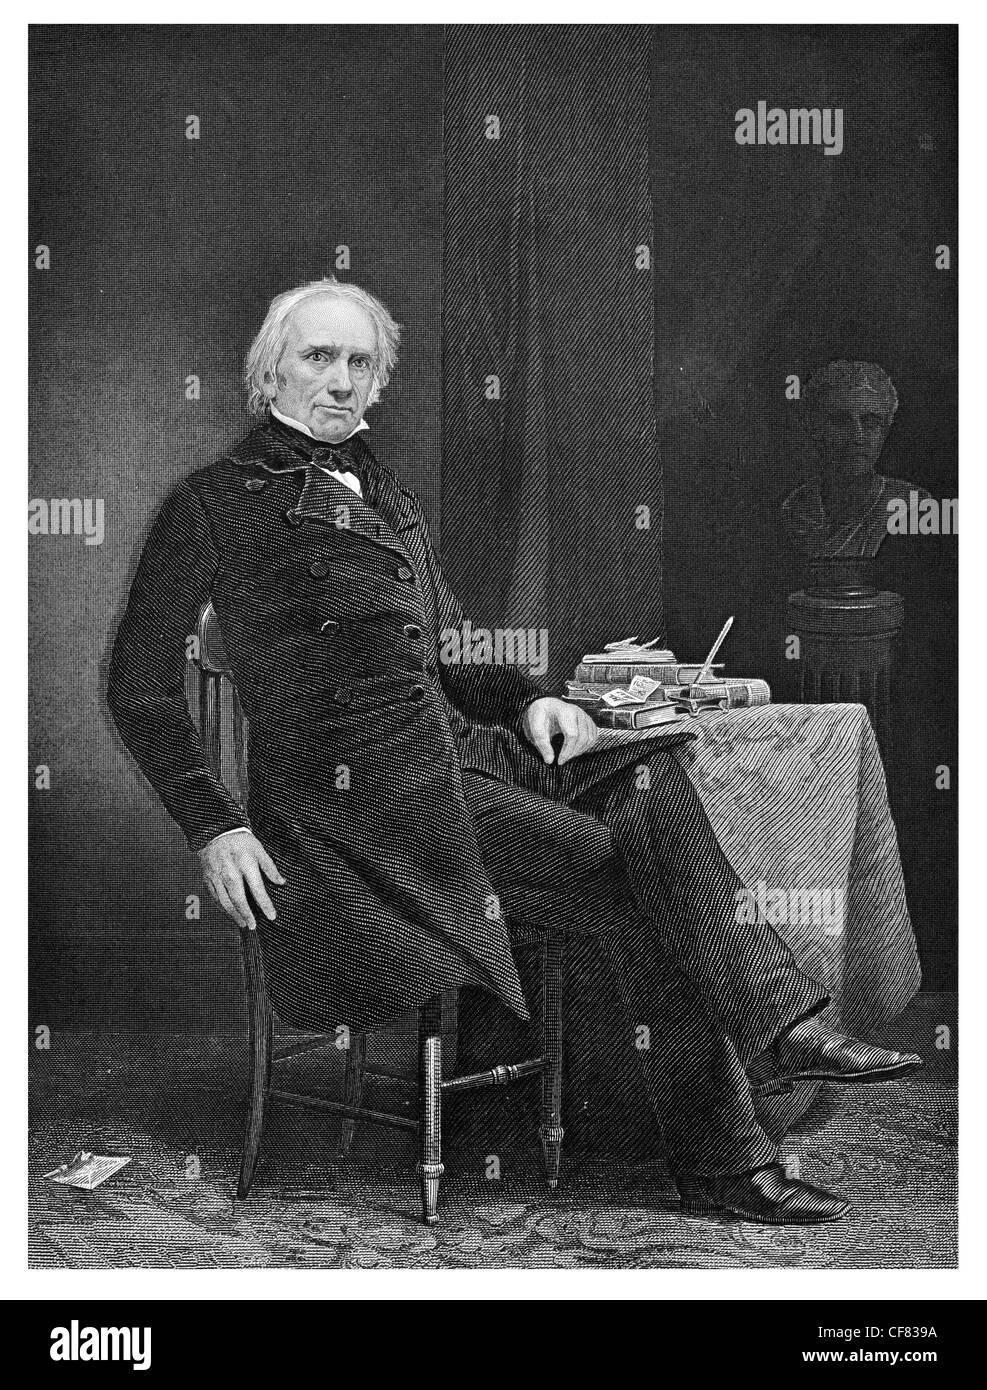 Henry Clay  1777 to 1852 American politician  statesman, orator, Senator - Stock Image